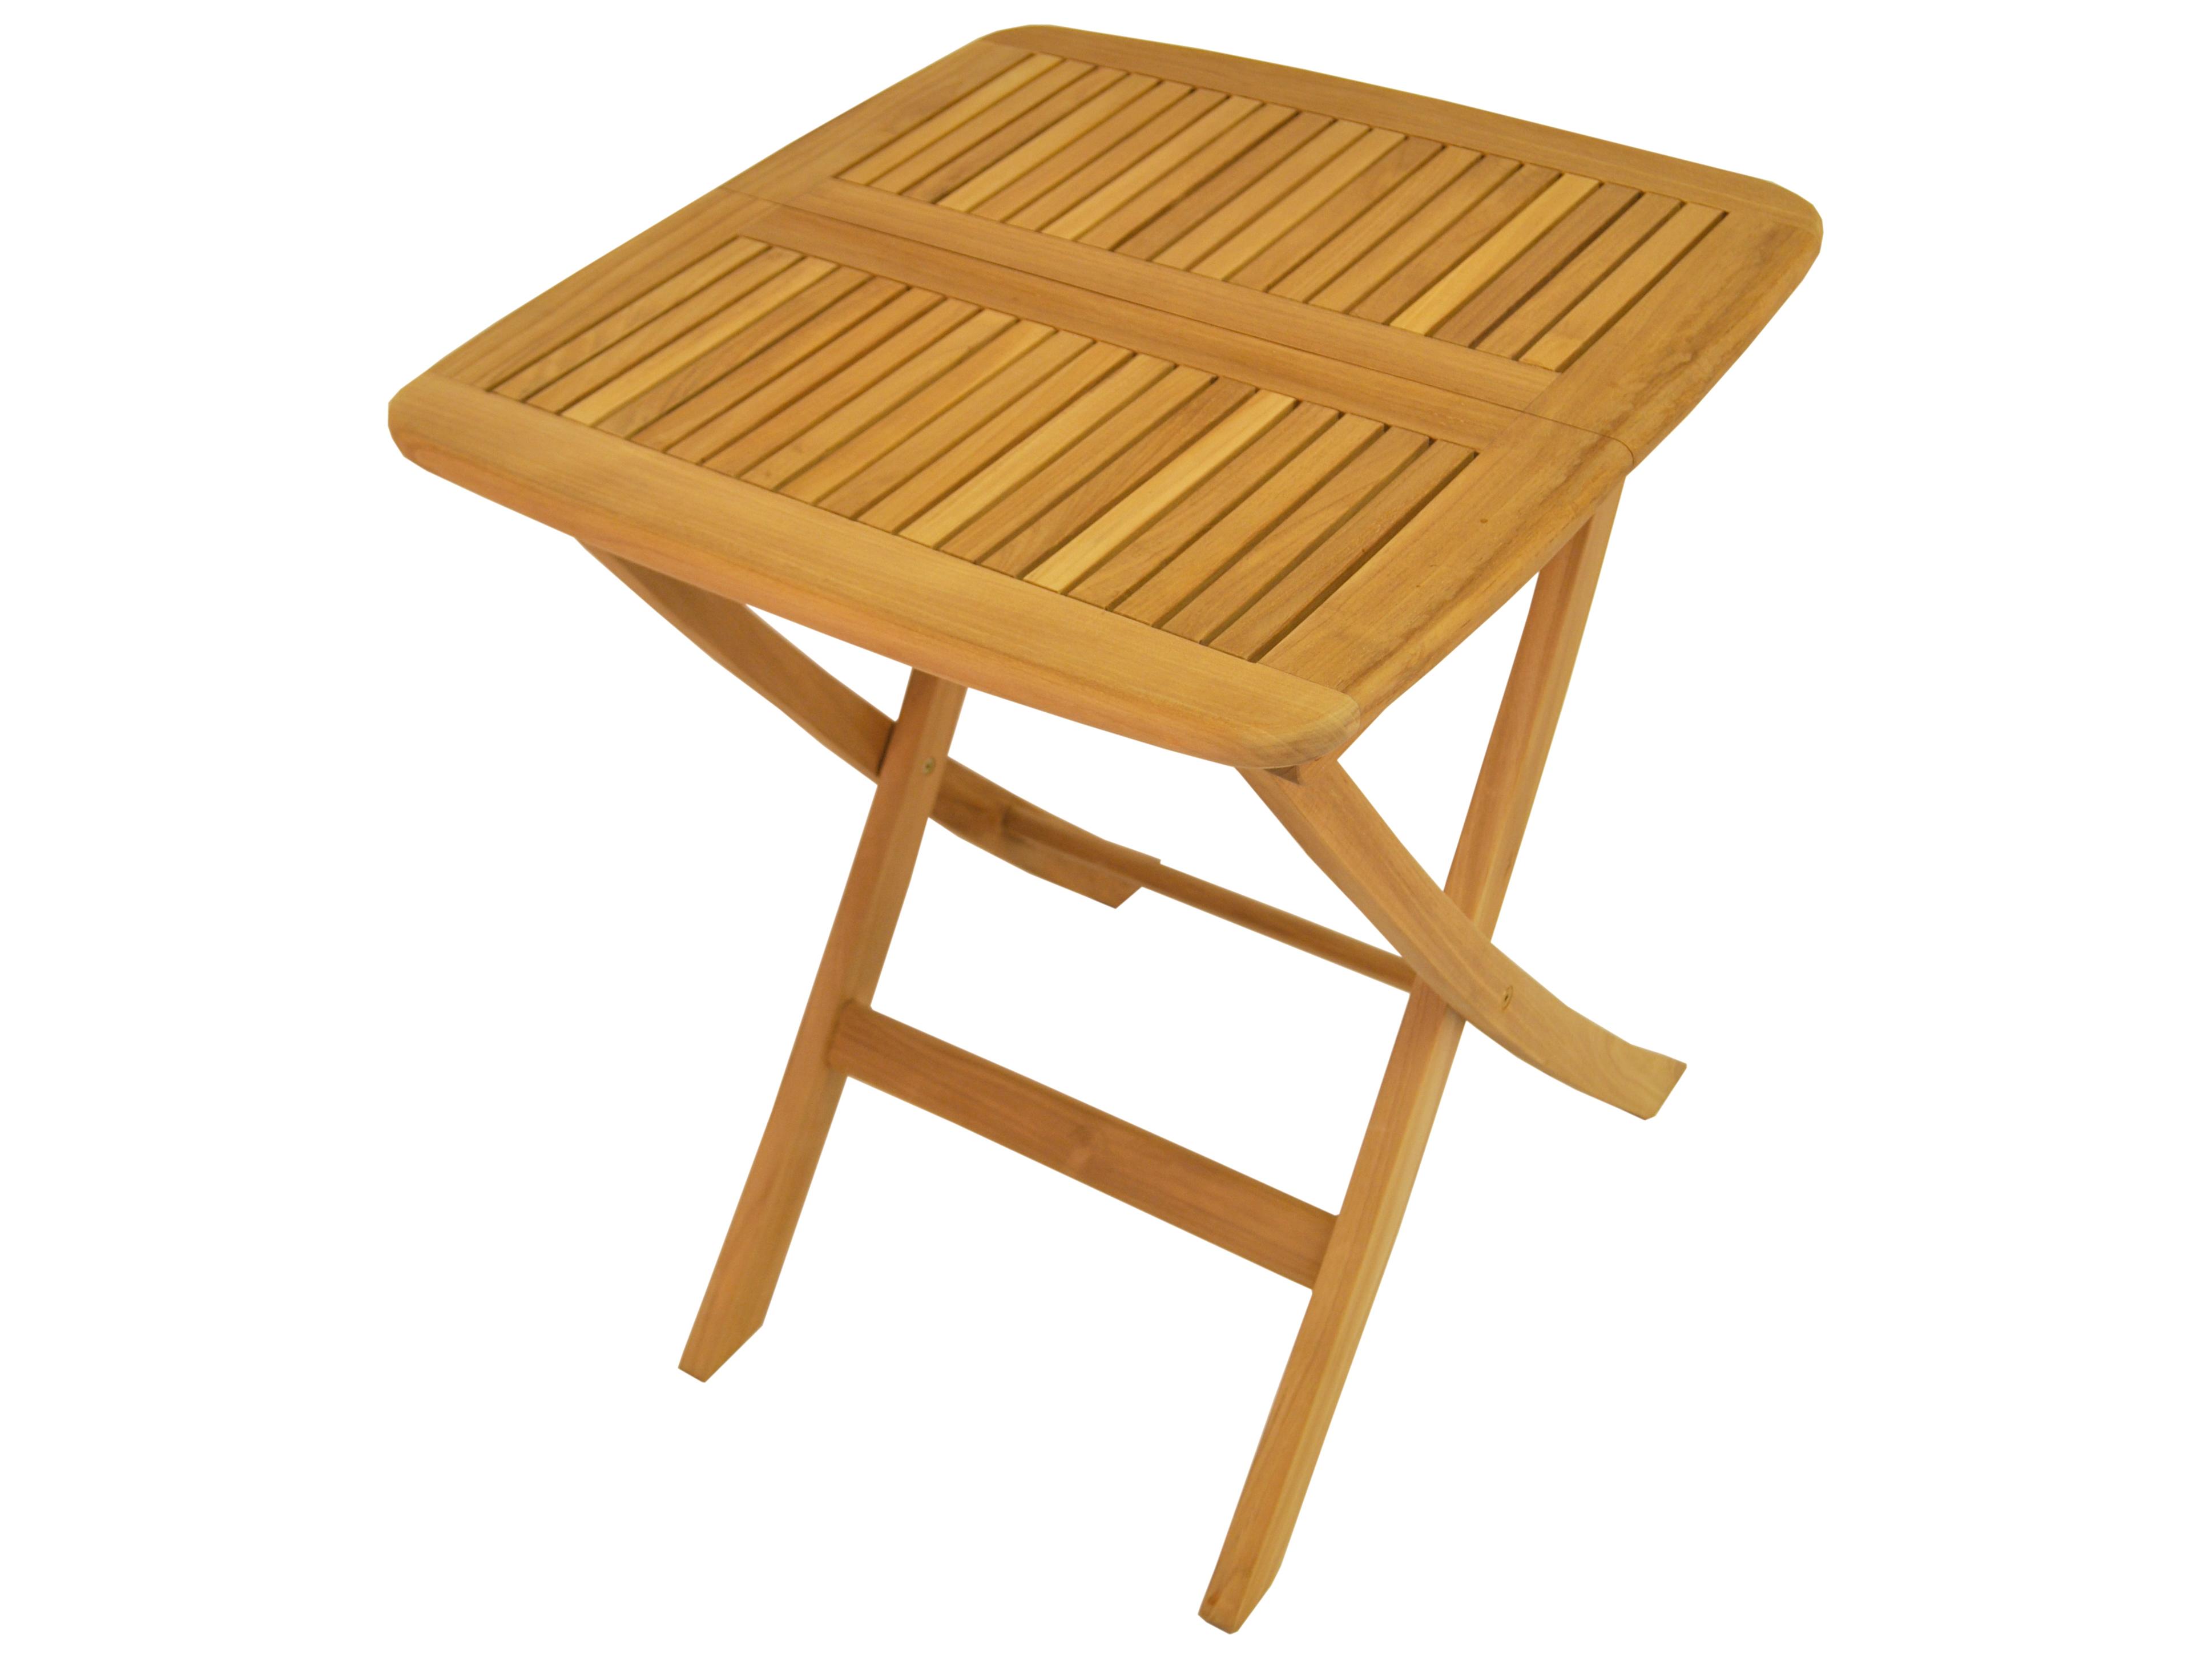 Anderson Teak Windsor 24 Square Folding Bistro Table